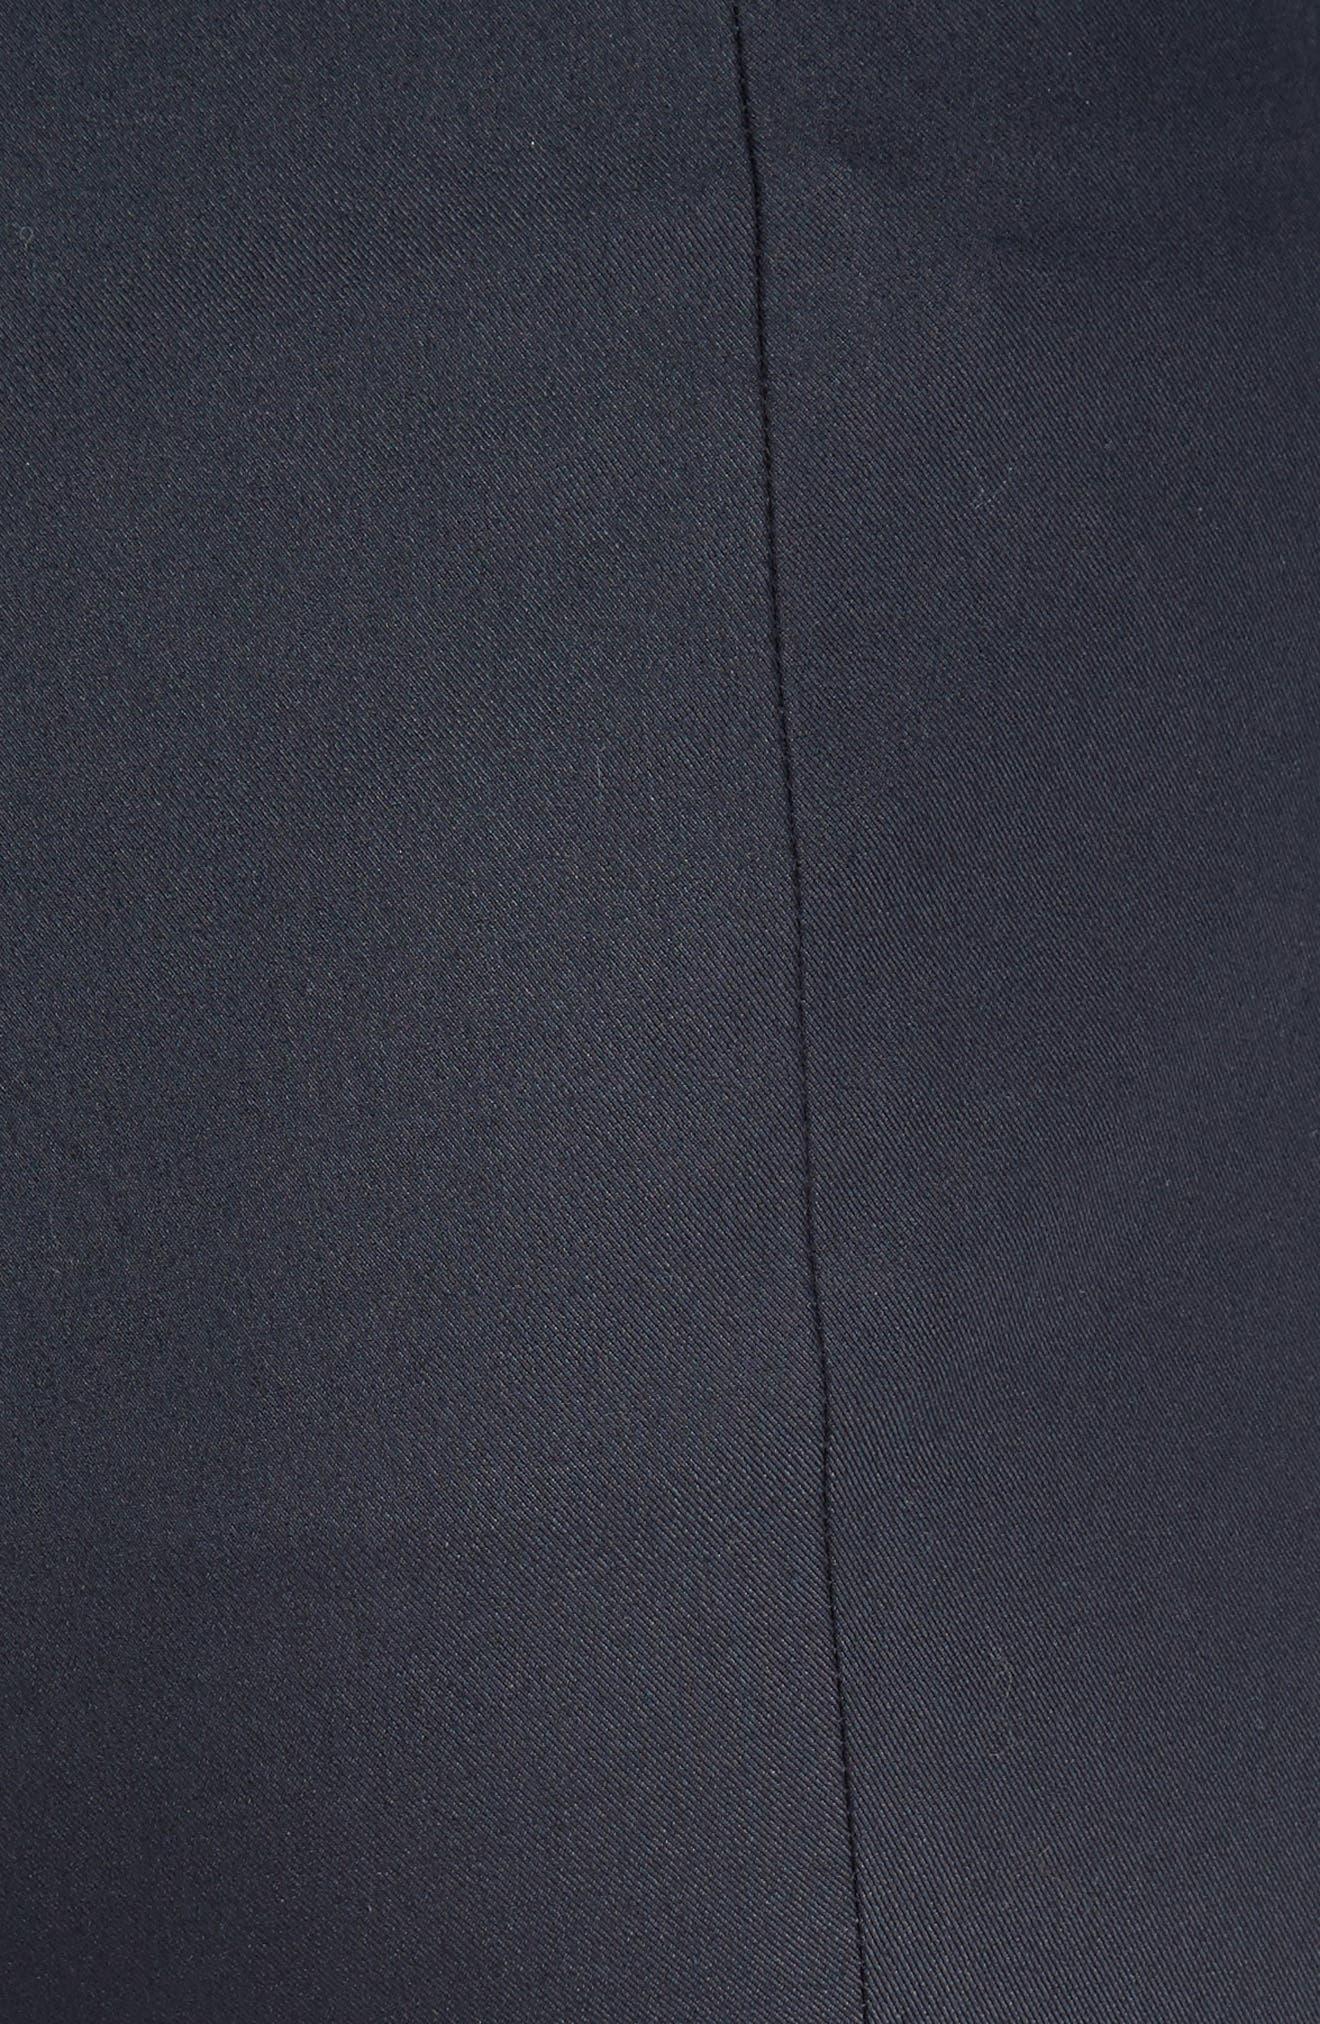 Alettah Stretch Skinny Pants,                             Alternate thumbnail 5, color,                             001